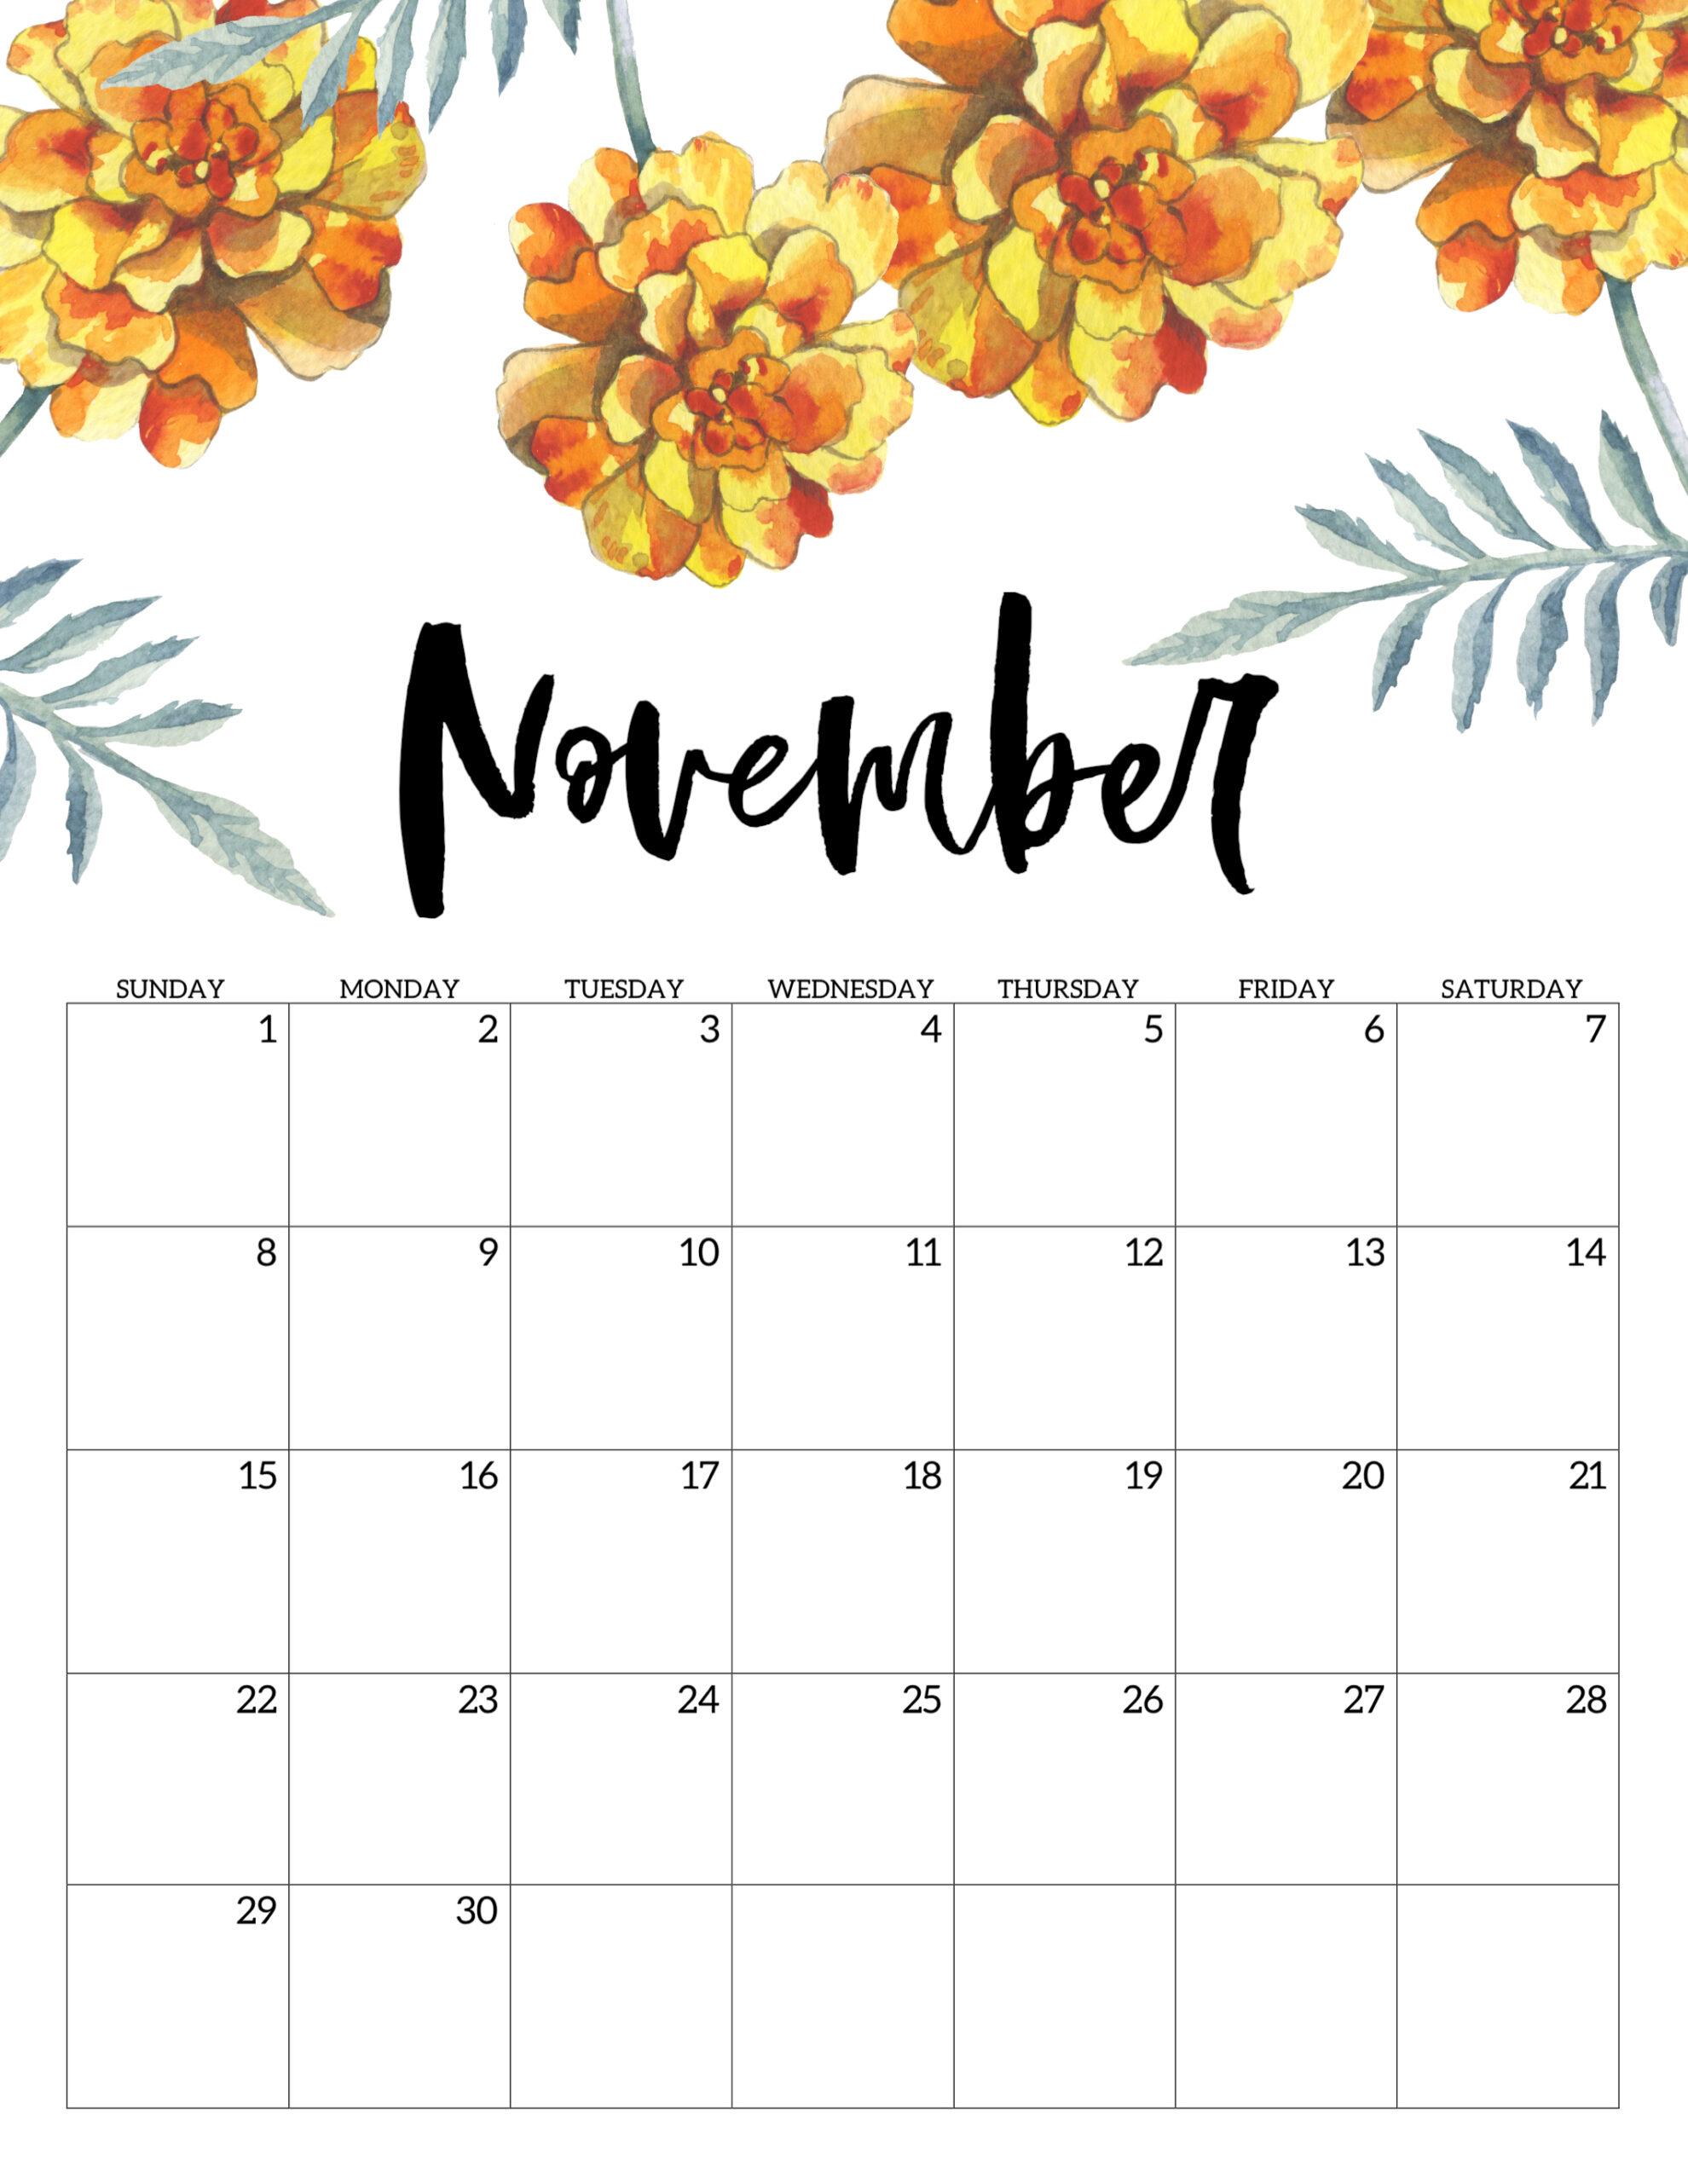 November Calendar 2020 Printable.Free Printable Calendar 2020 Floral Paper Trail Design